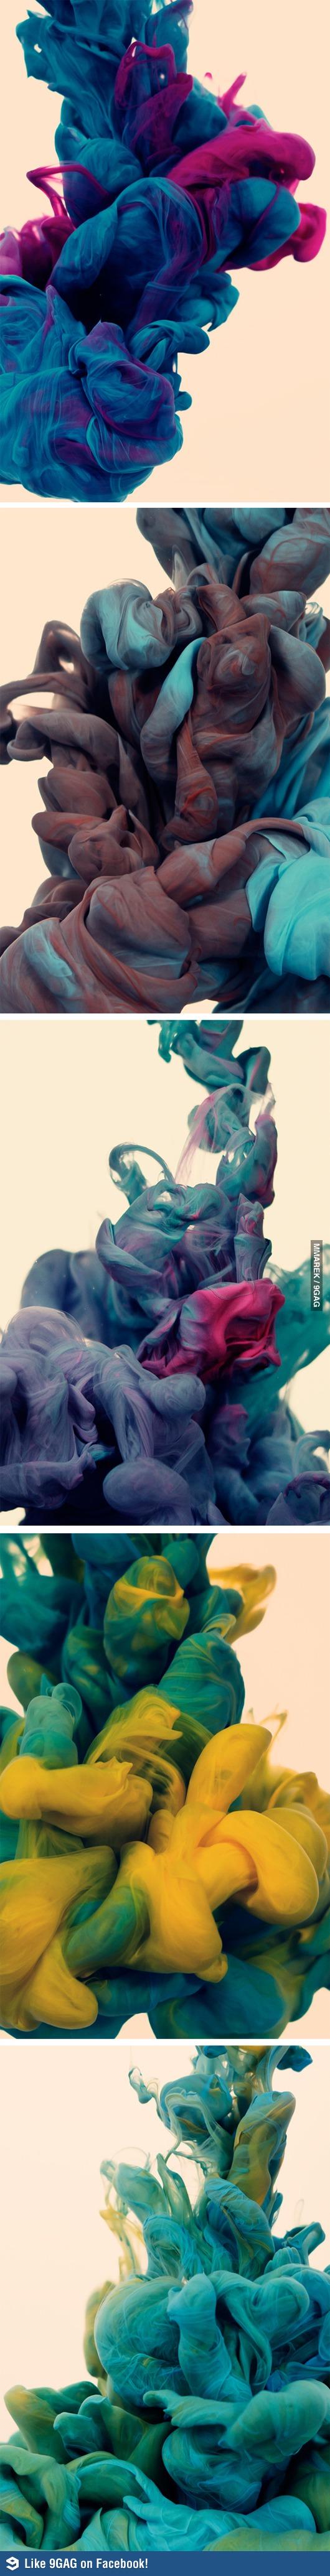 amazing Smoke art by mmarek (@9Gag 3665367)